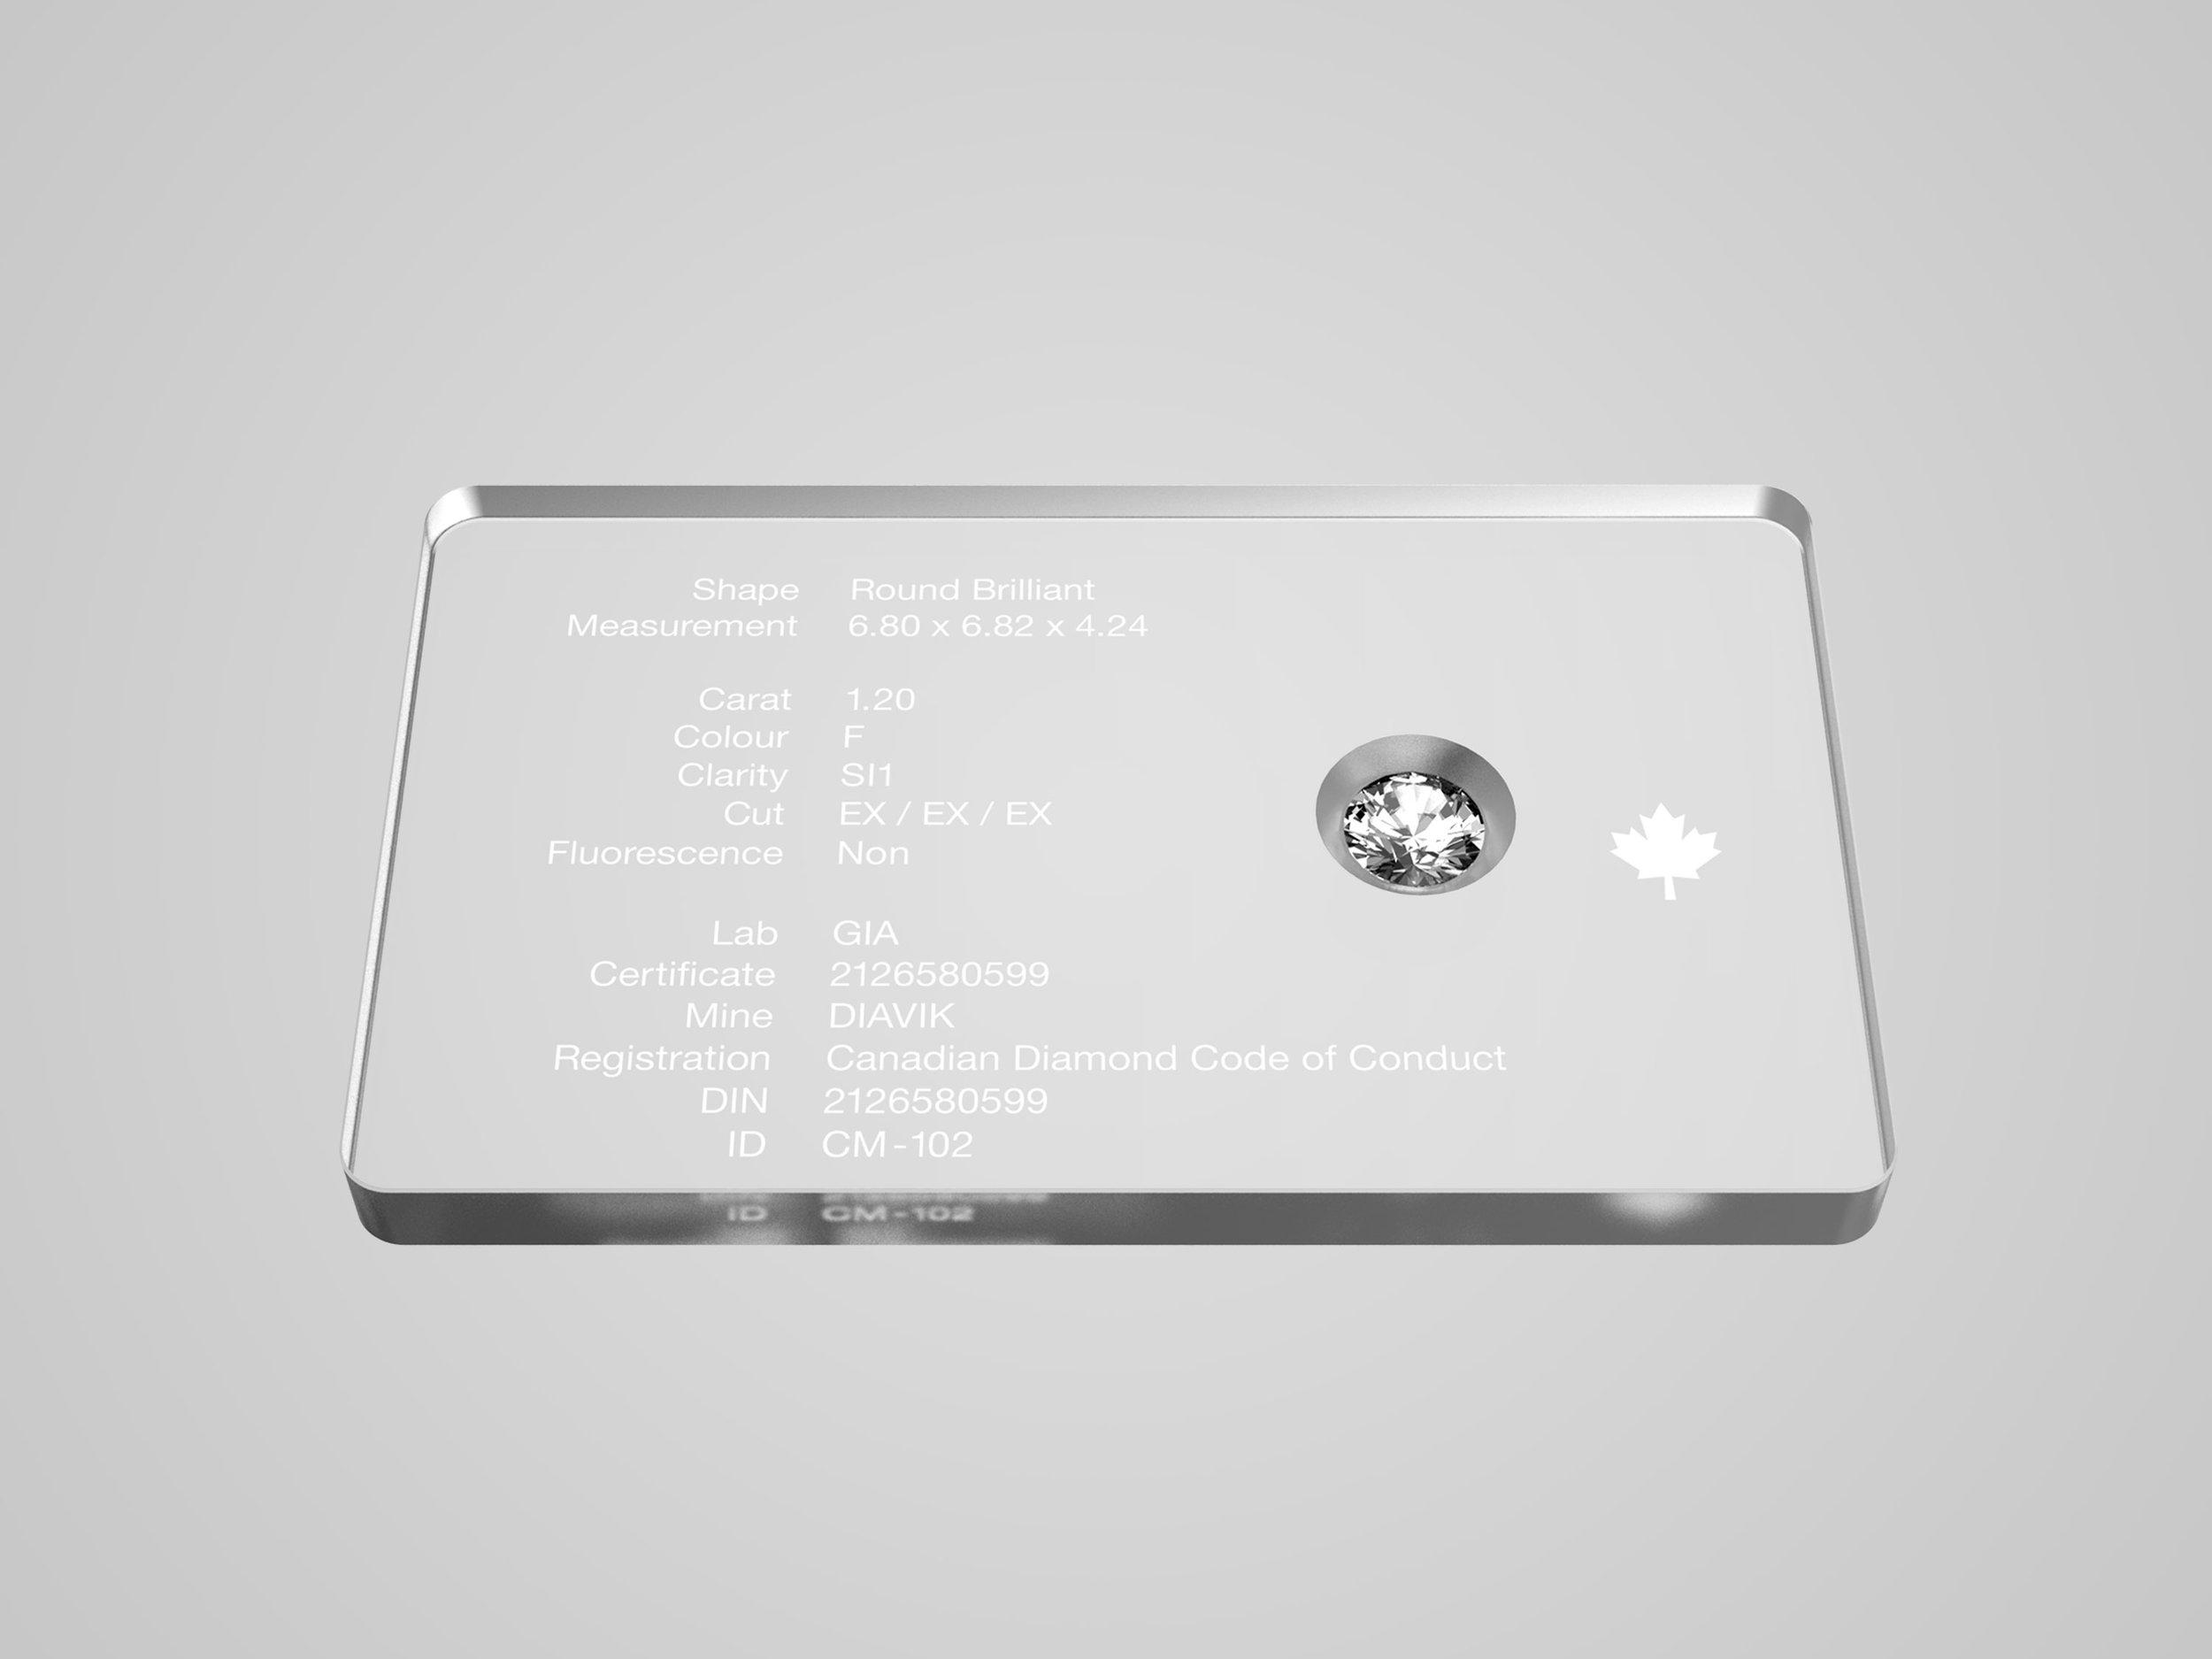 Vantyghem Diamonds - Diamond Authentication Plate System